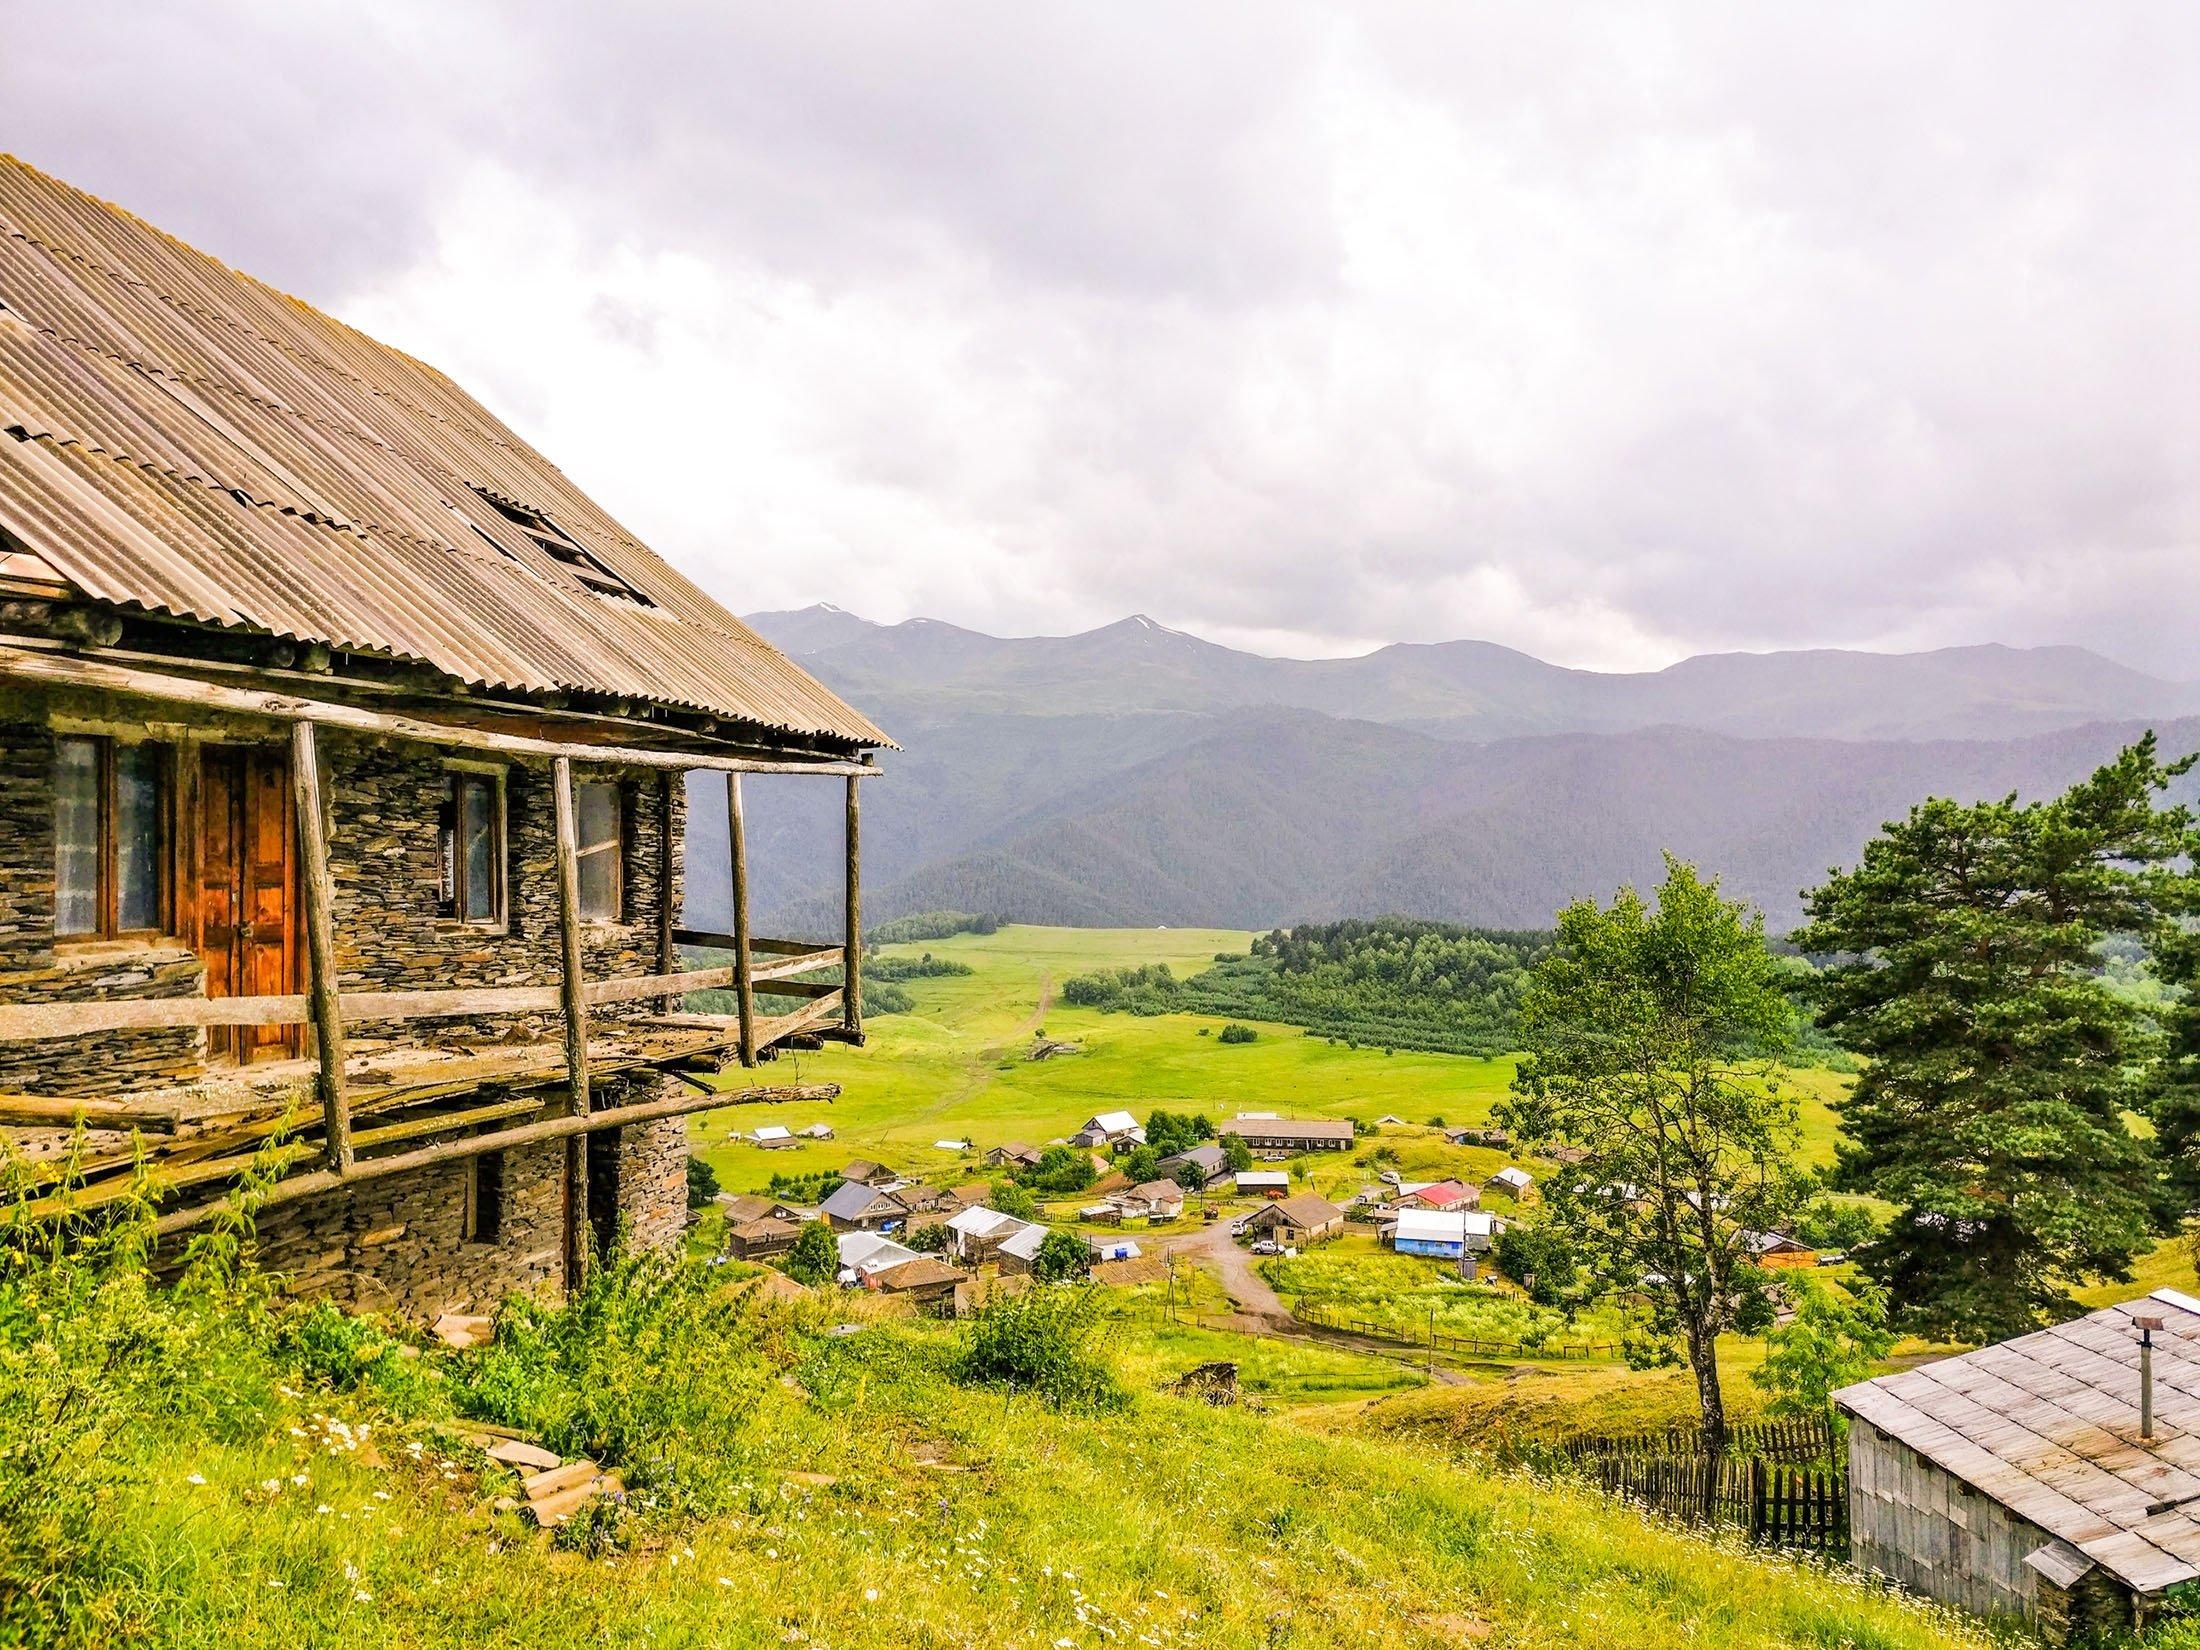 General view of Tusheti mountains. (Shutterstock Photo)